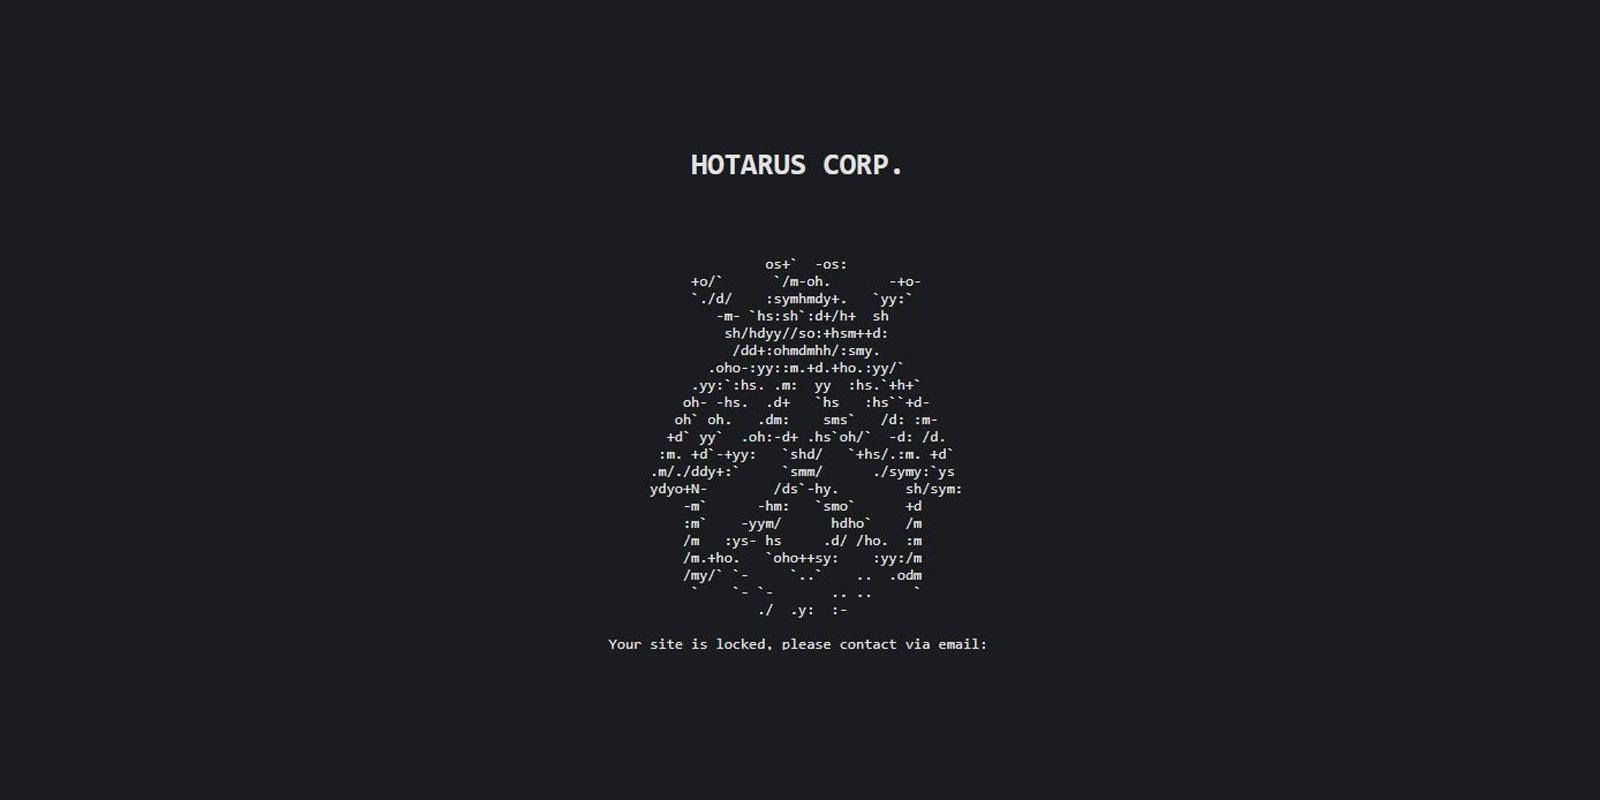 Hotarus Corp